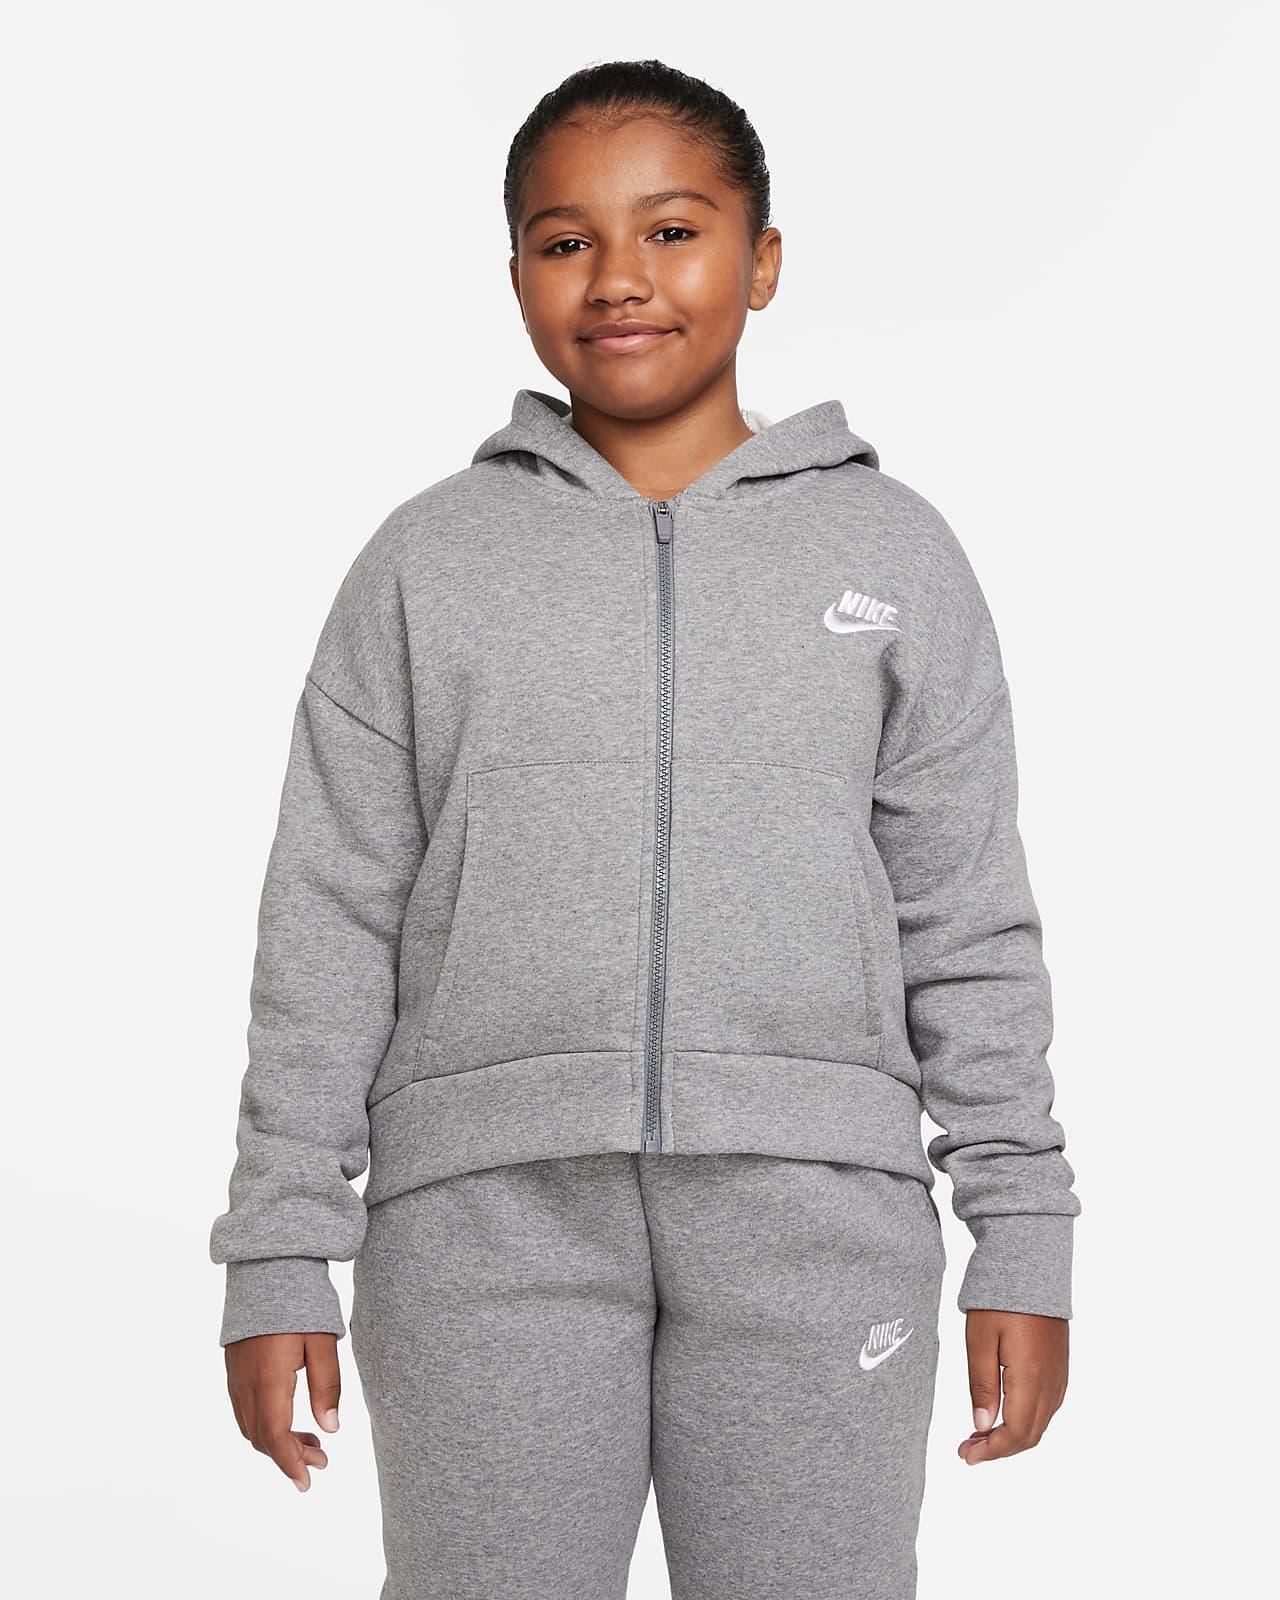 Hoodie com fecho completo Nike Sportswear Club Fleece Júnior (Rapariga) (tamanhos grandes)